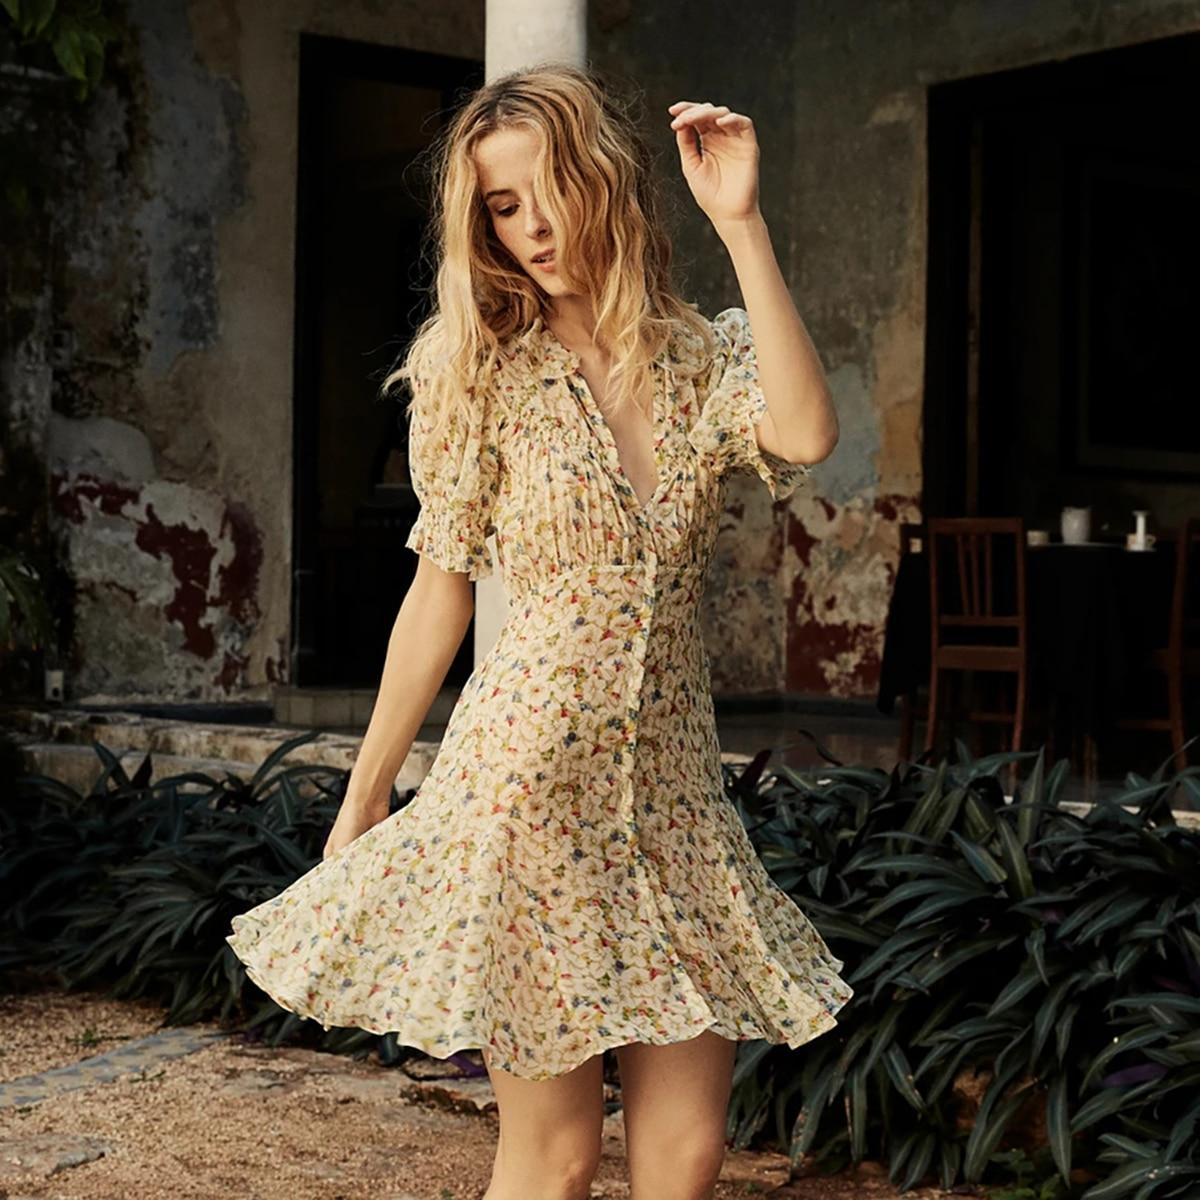 Floral Print Ruffle Hem Mini Dresses Summer 2020 Chic Puff Sleeve Button Sashes Lining Short Dress Women Casual Vintage Vestidos